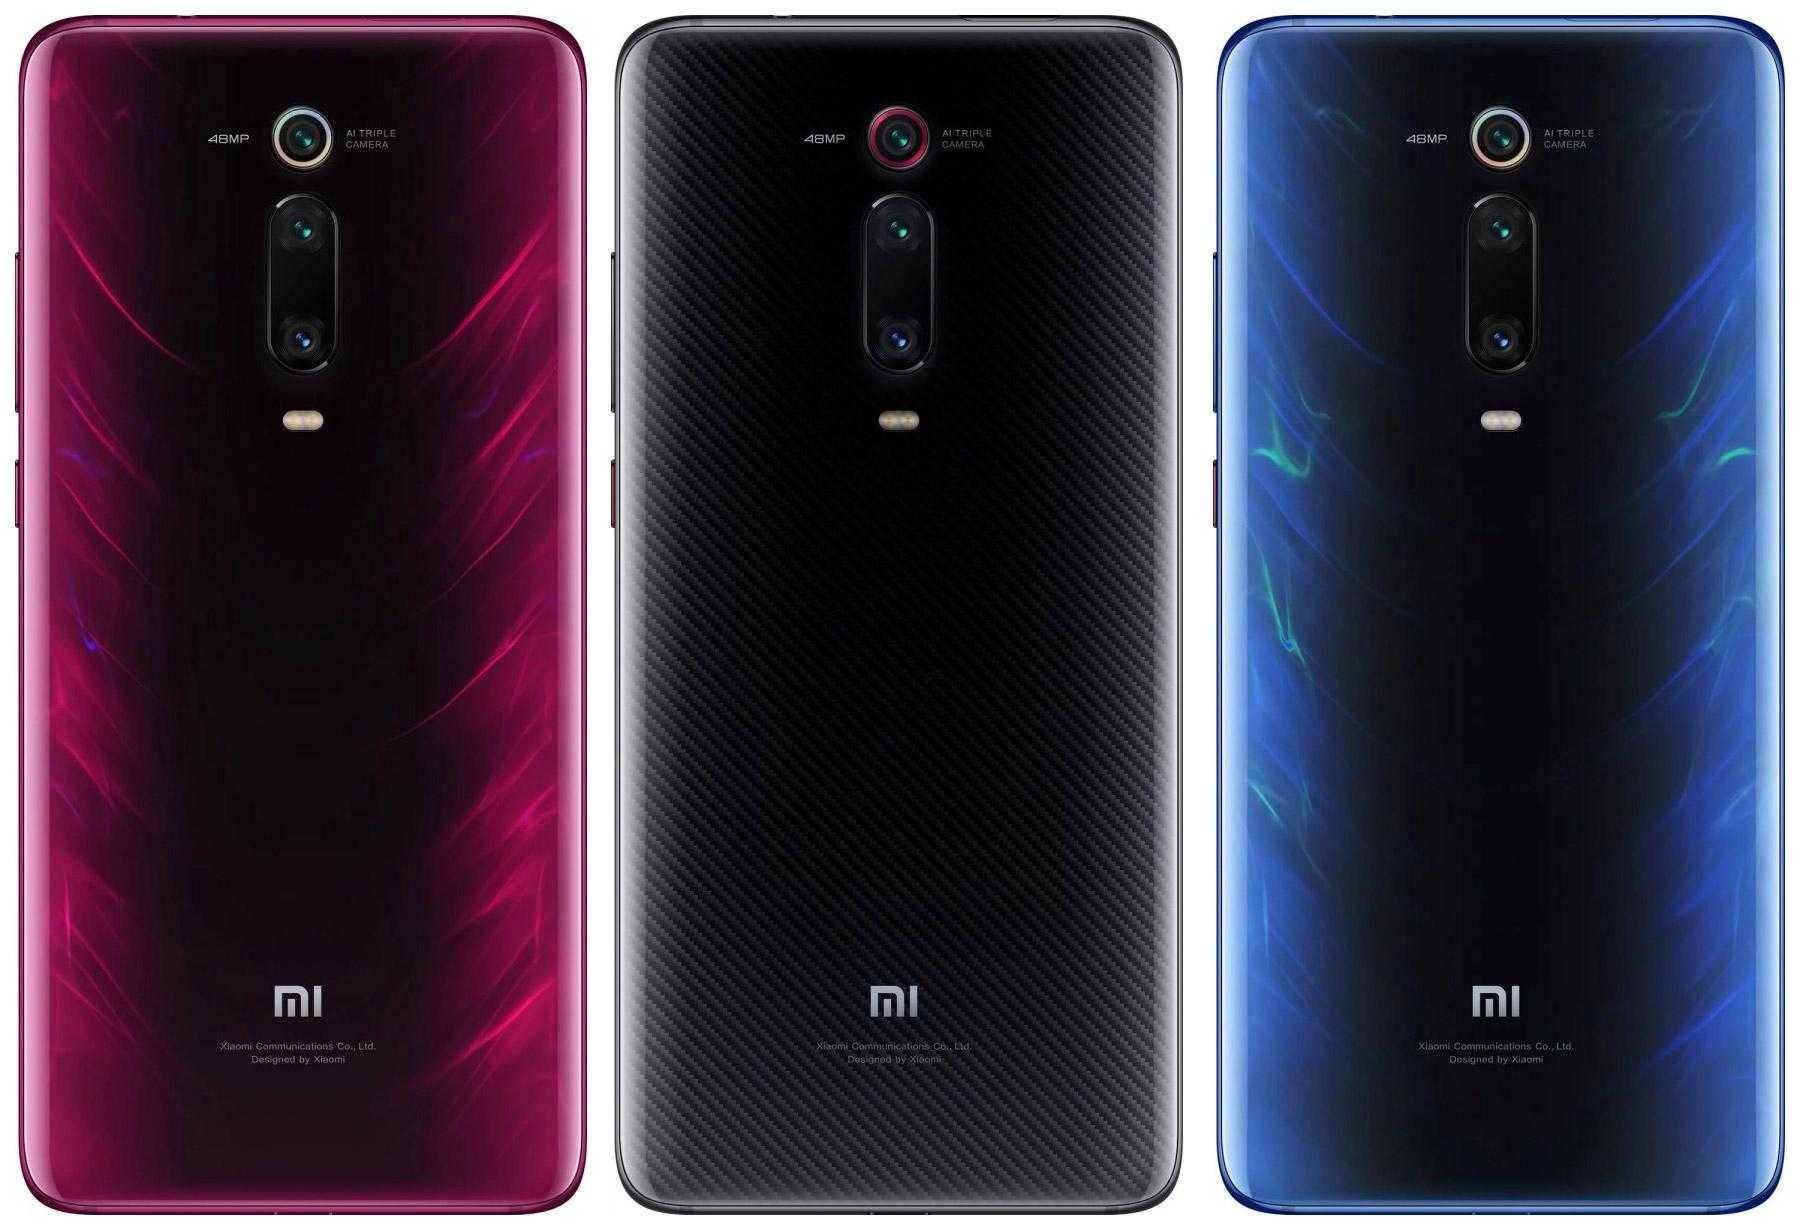 Xiaomi mi 9t pro - купить недорого  смартфон сяоми ми 9т про в москве в mistore-russia